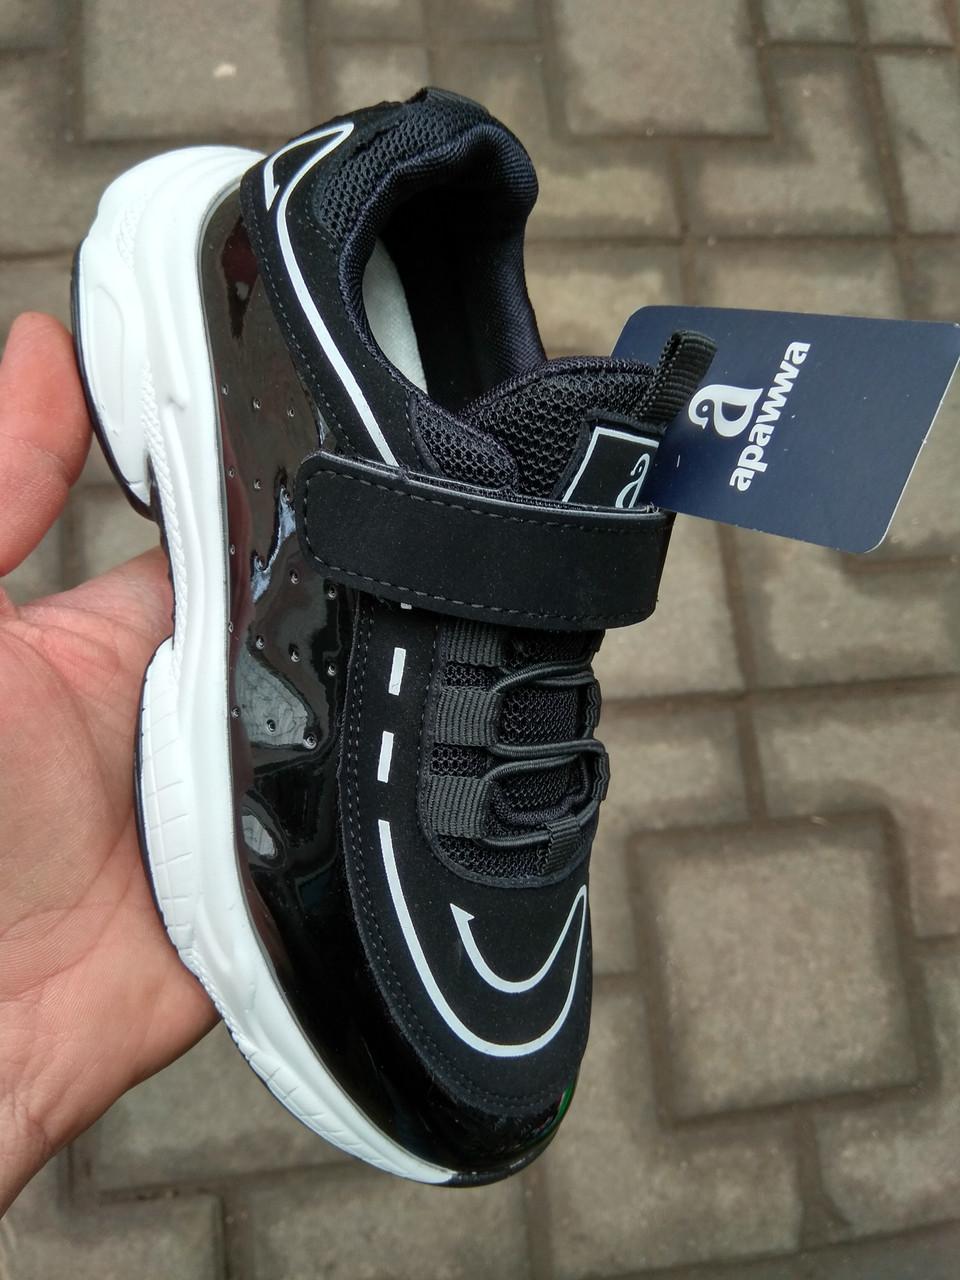 4766cfcb6 Детские кроссовки оптом Apawwa CC62 black (р.31-36), цена 349,11 грн ...